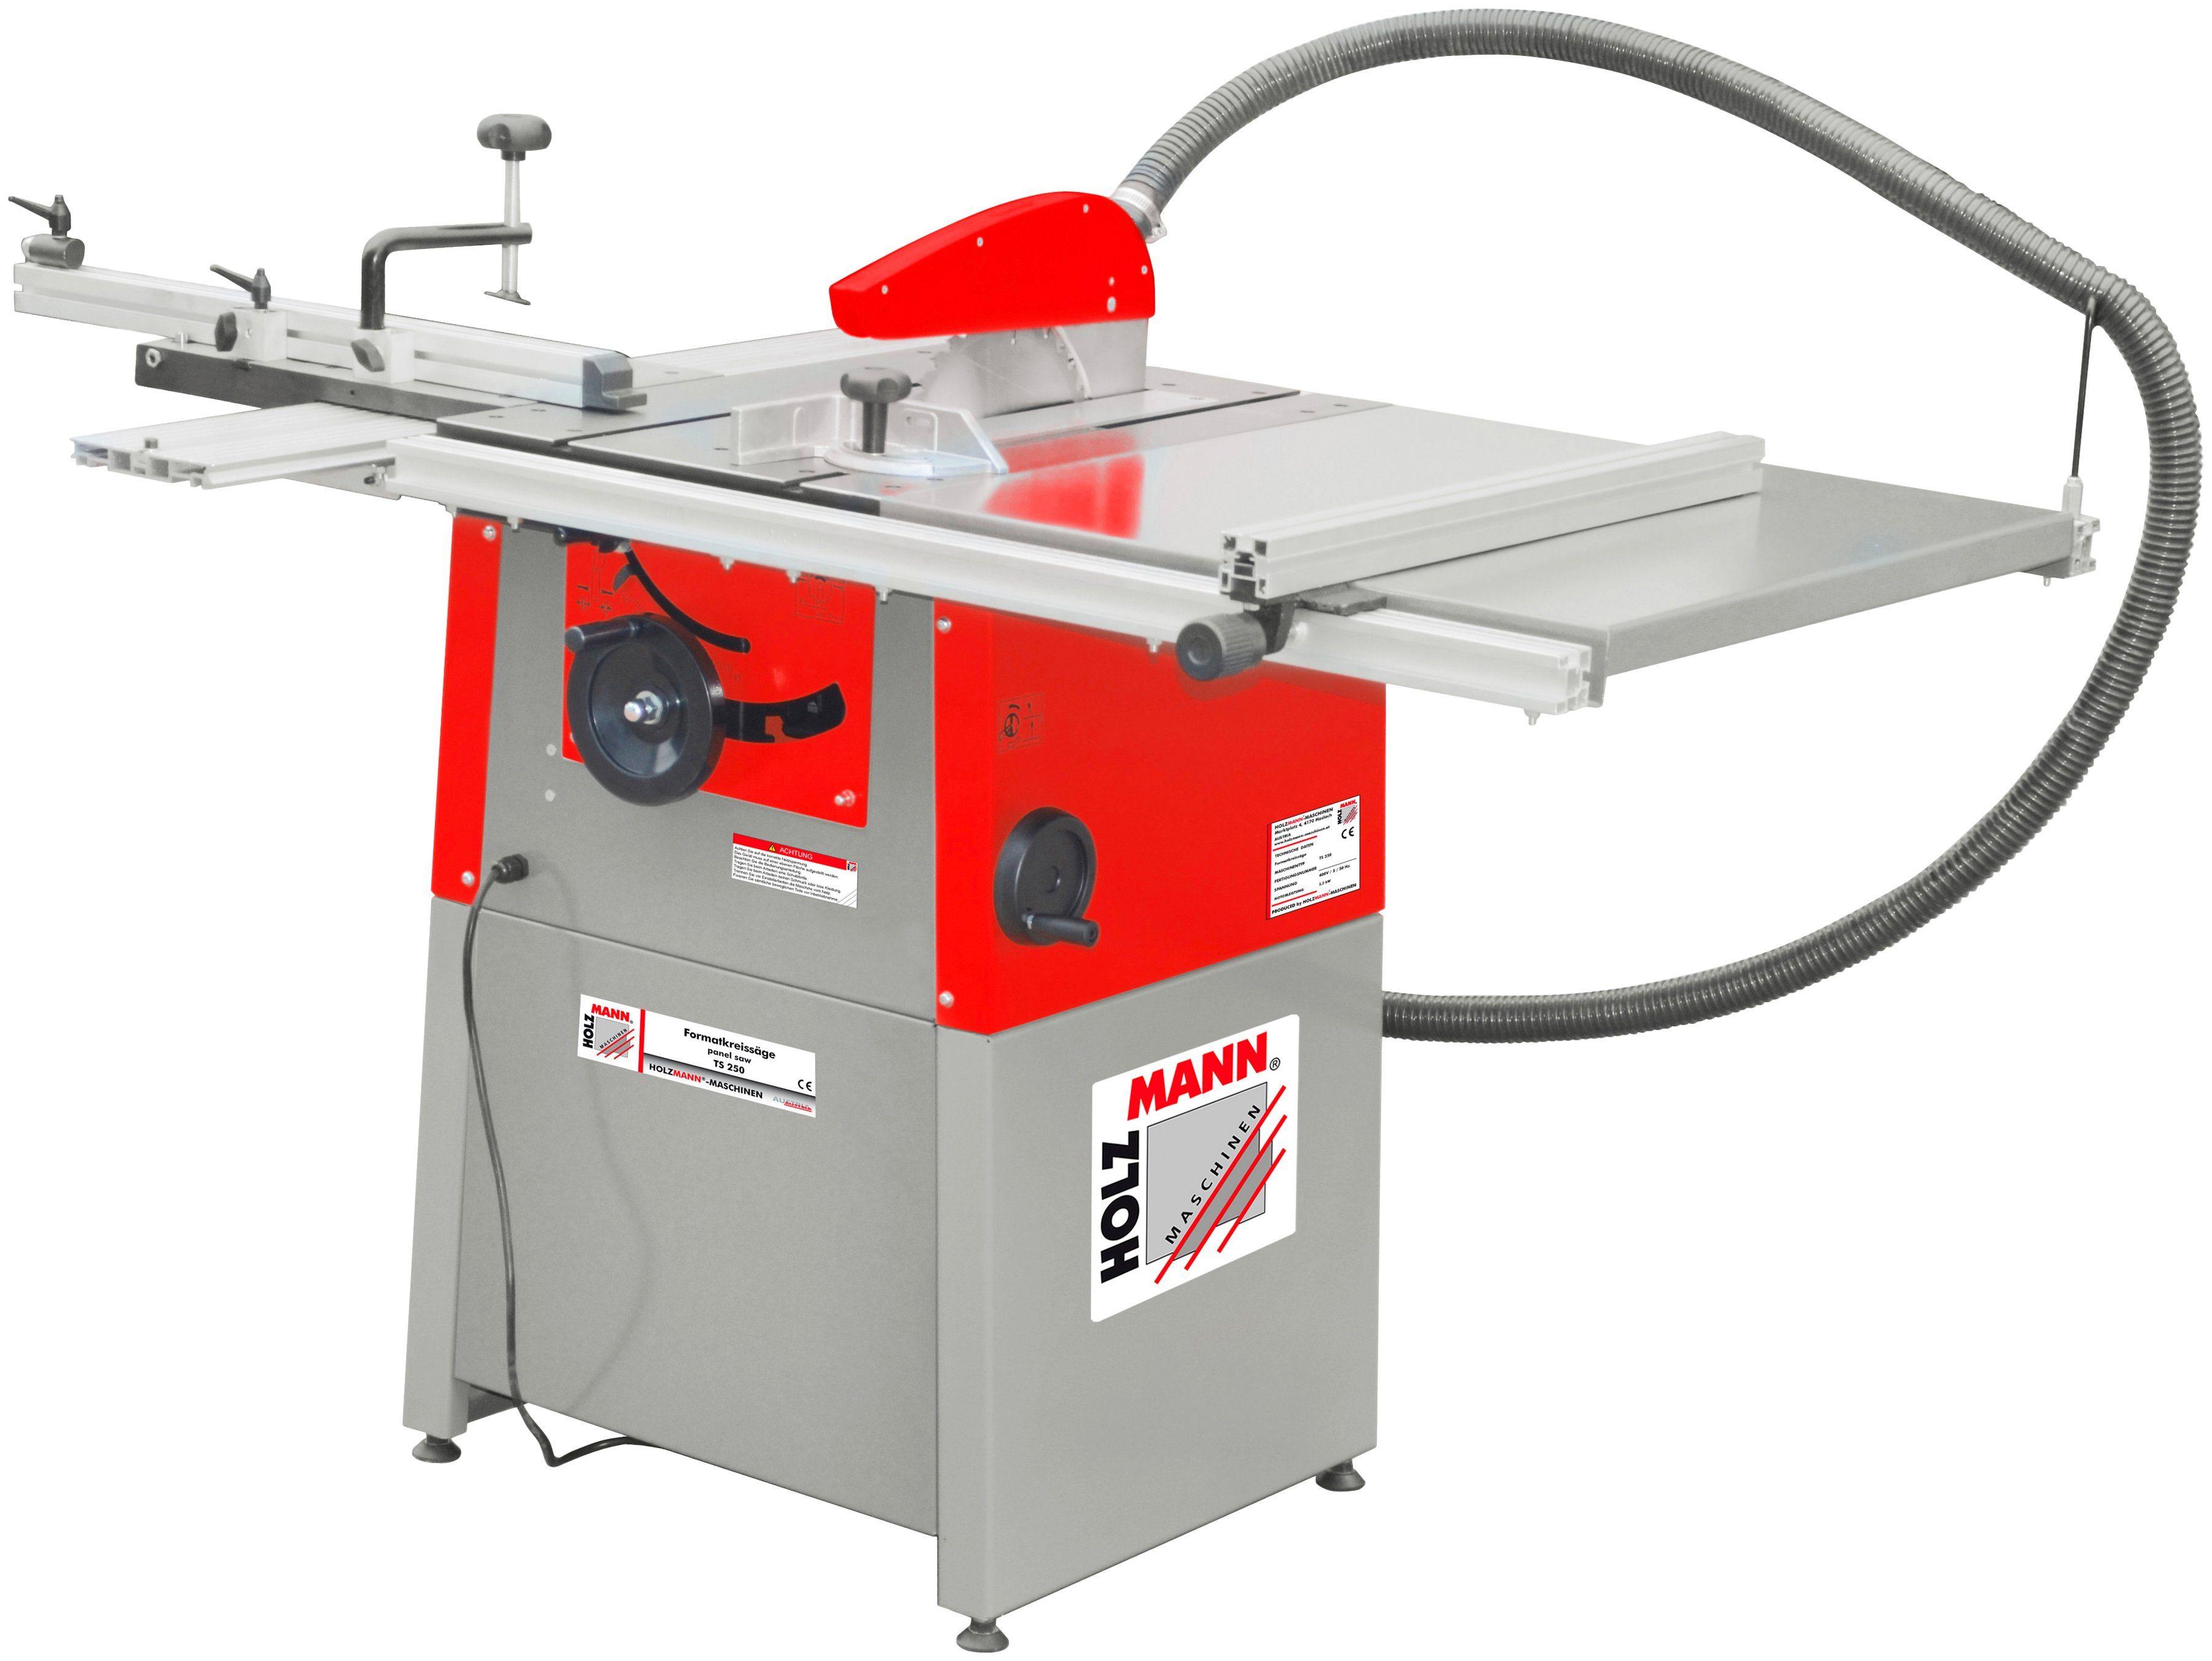 HOLZMANN-MASCHINEN Tischkreissäge »TS250_400V«, 2200 W, 254 mm